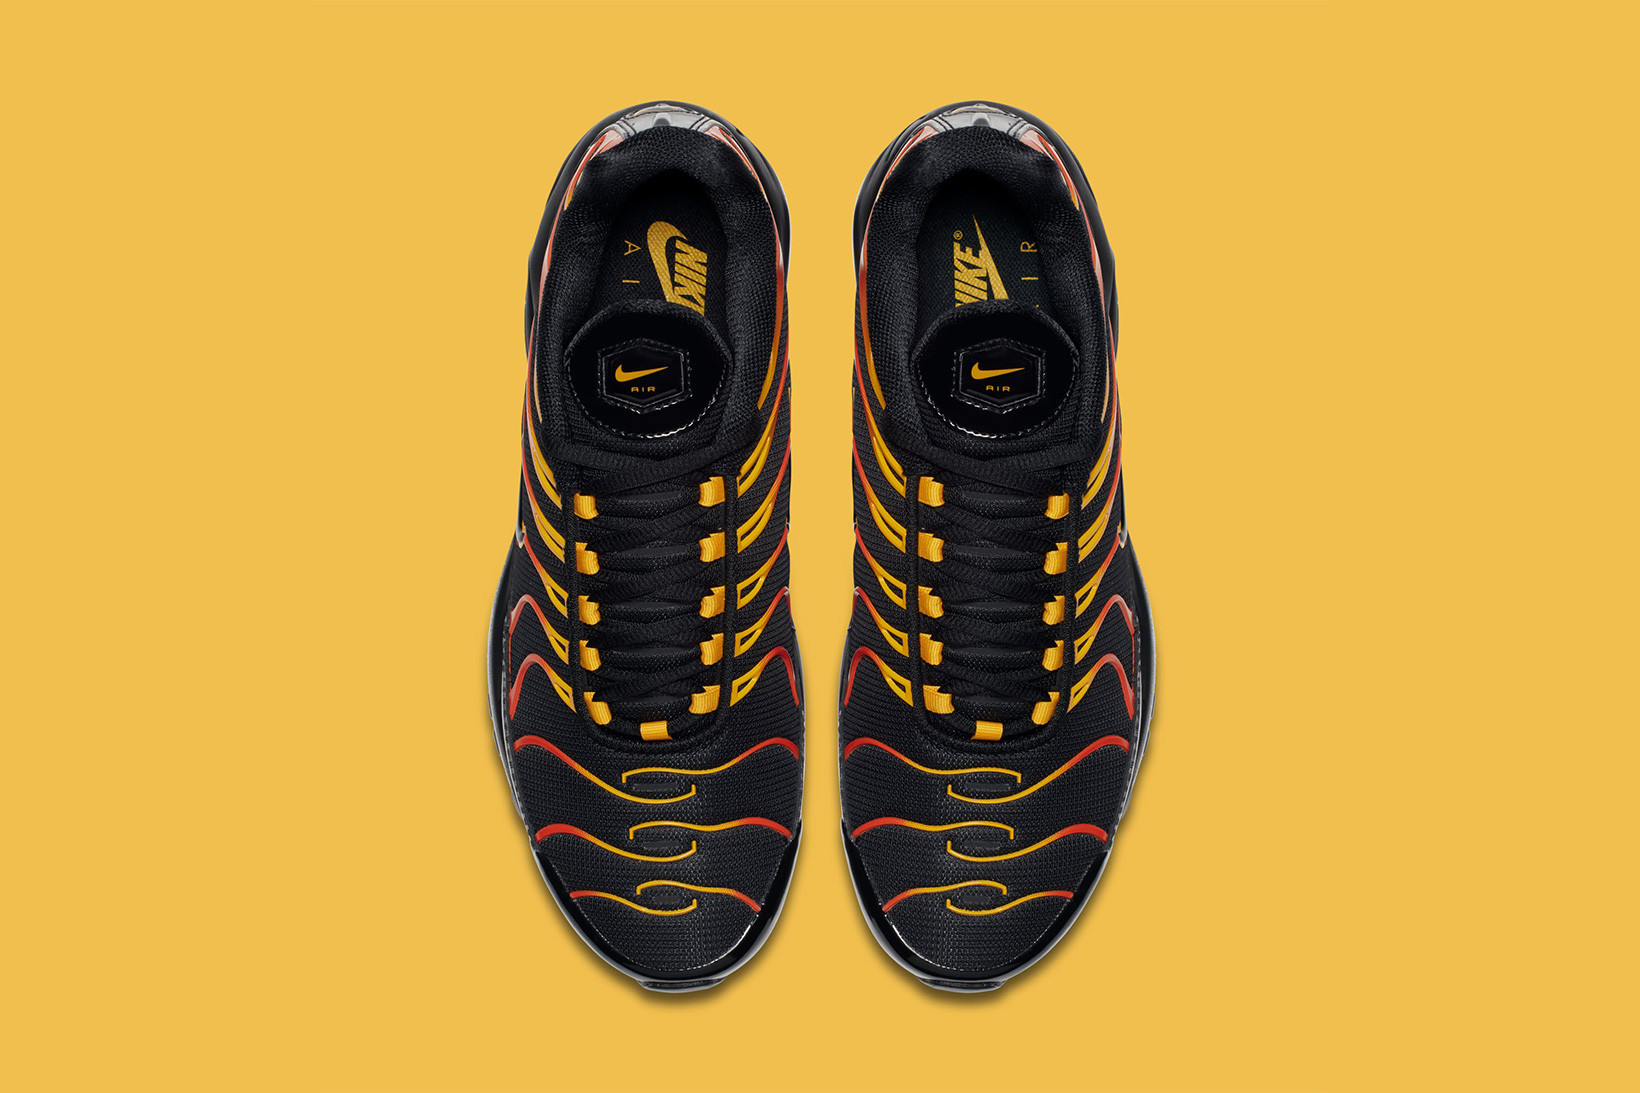 Nike Air Max 97/Plus in Black/Red